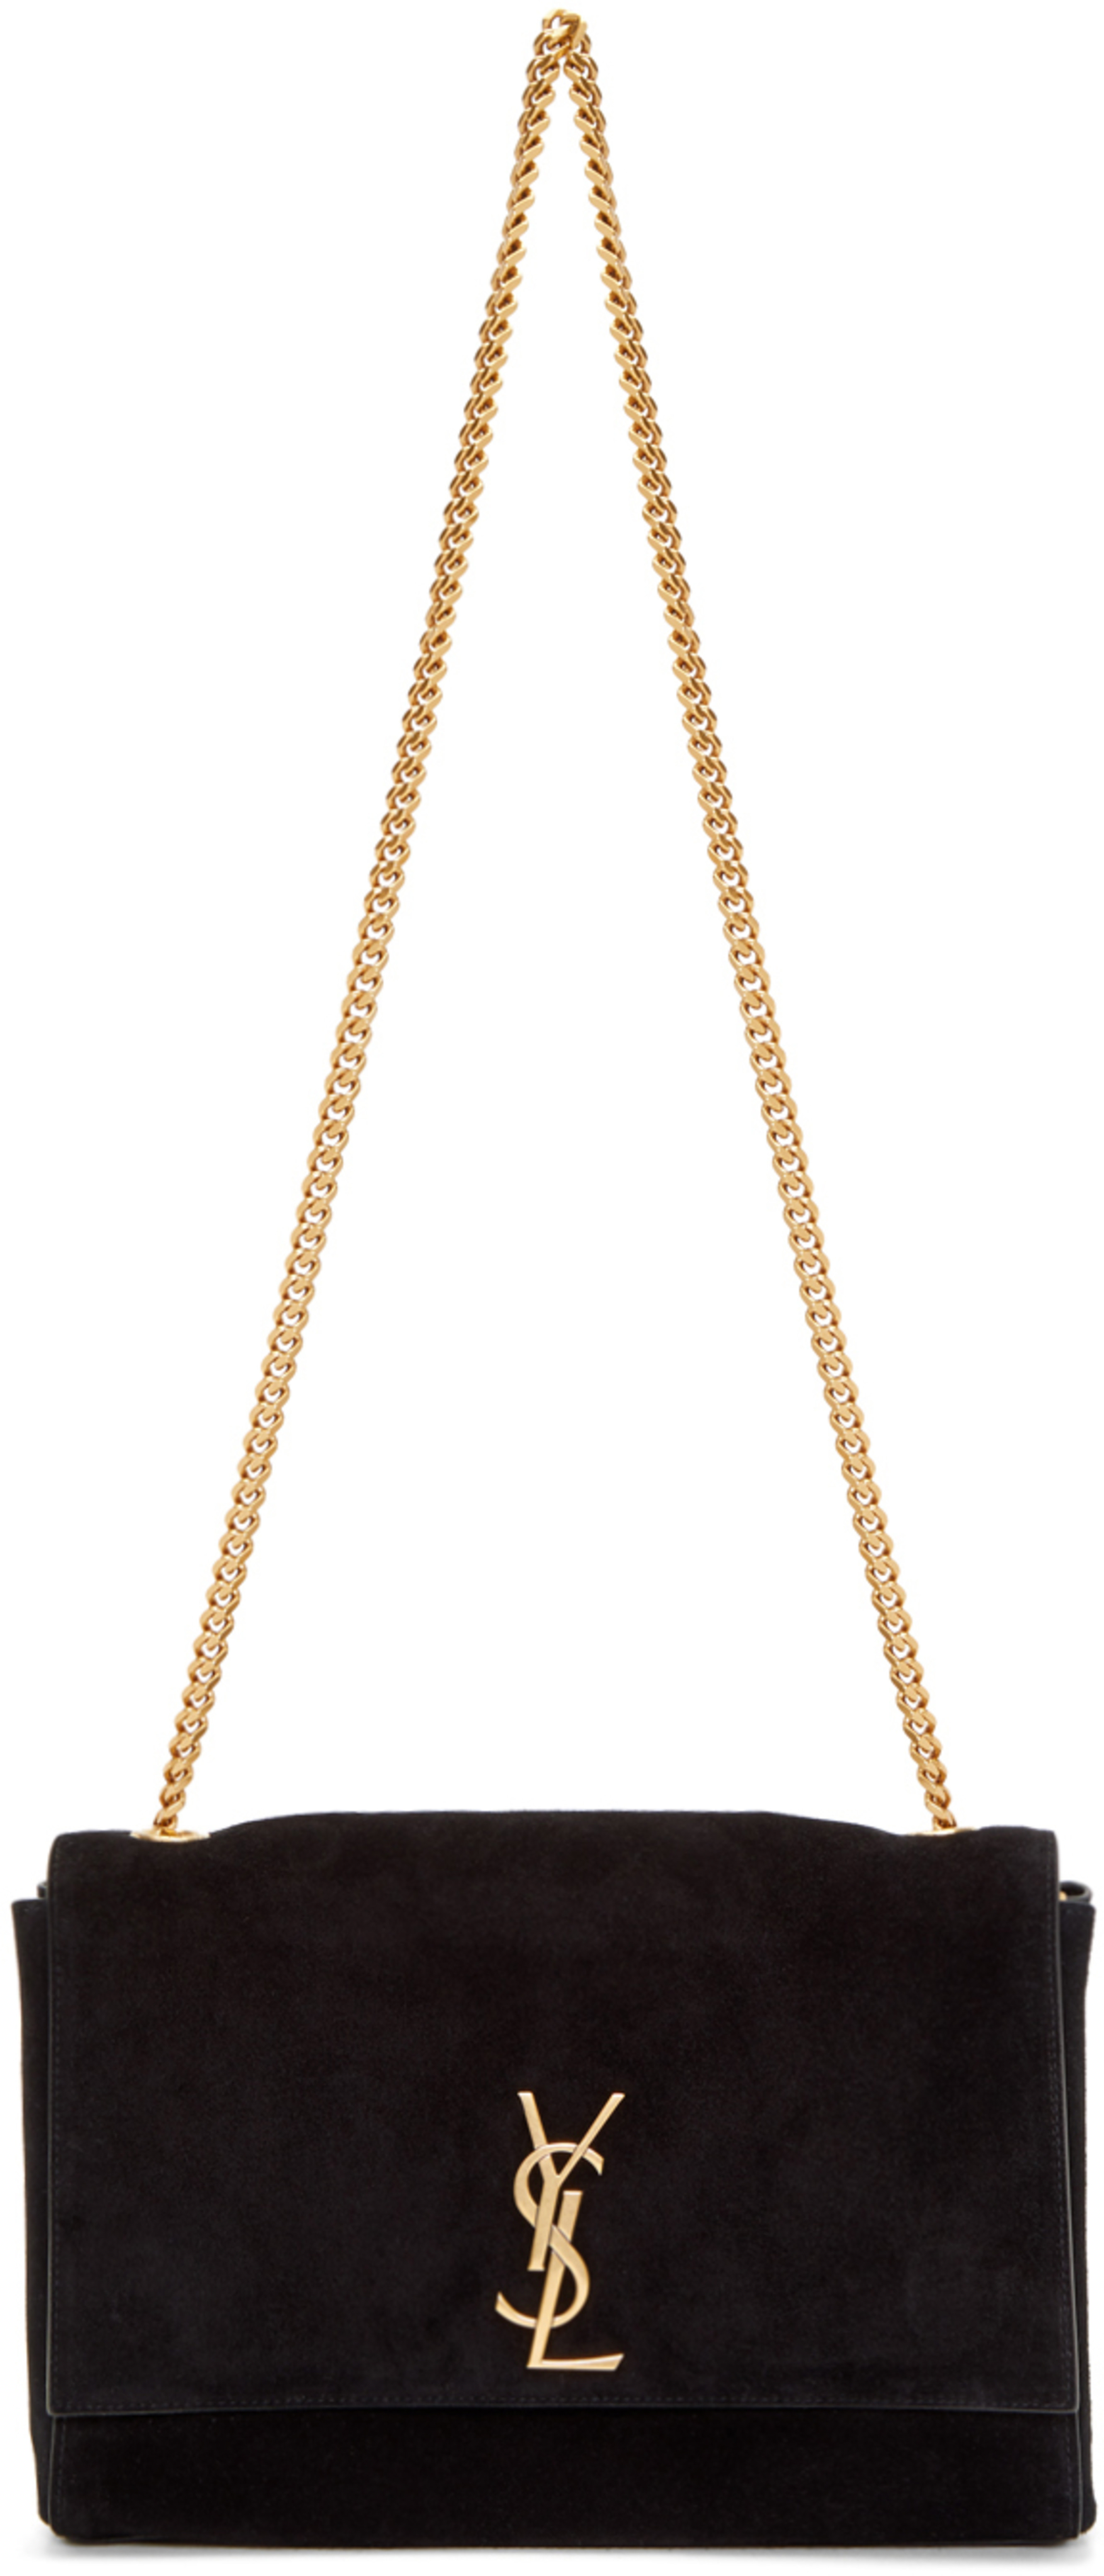 cdcb08712c38 Saint Laurent bags for Women